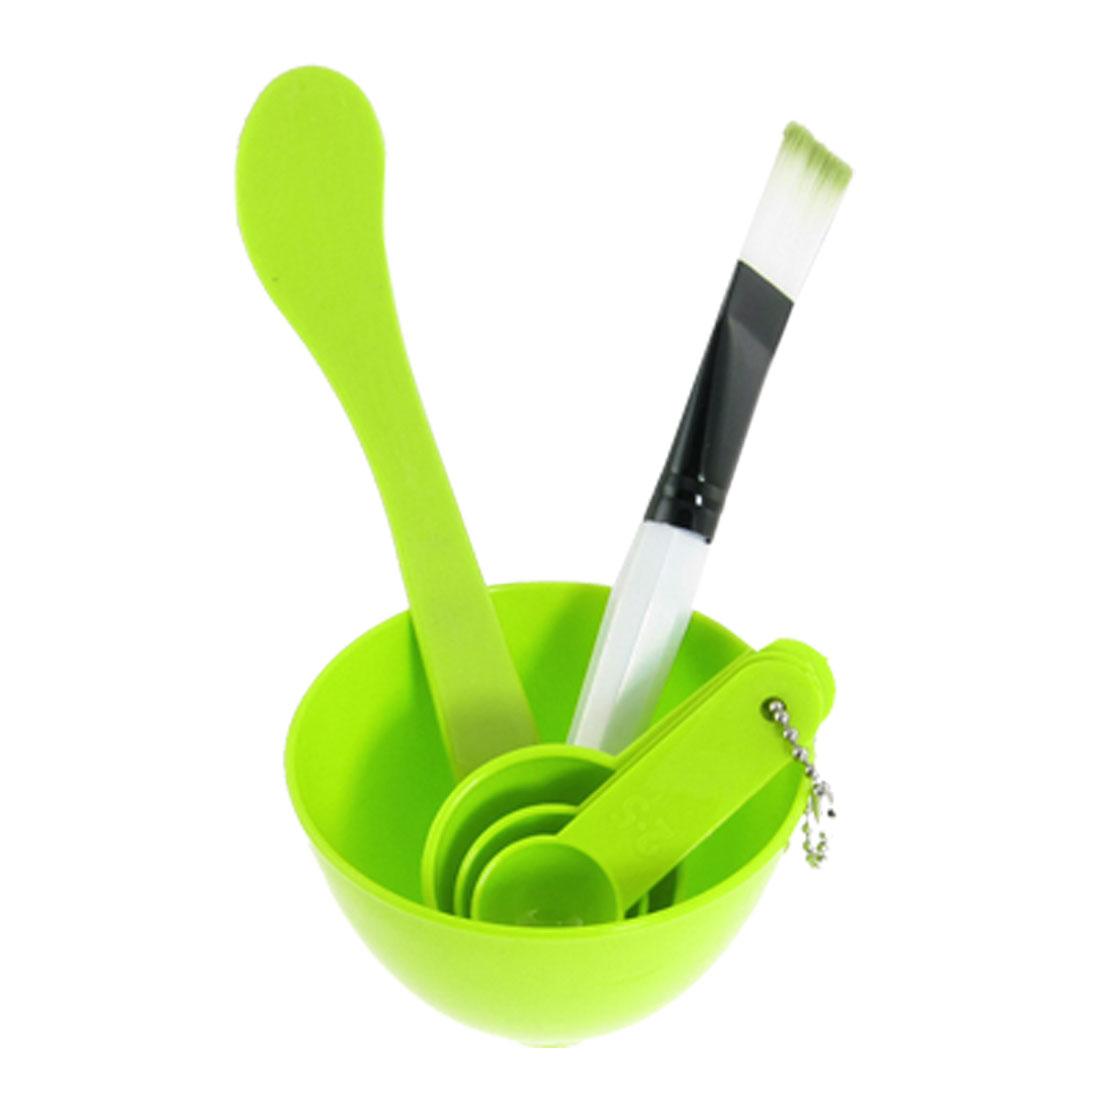 Green 4 In 1 Homemade DIY Facial Mask Bowl Gauge Spoons Stick Tools Set